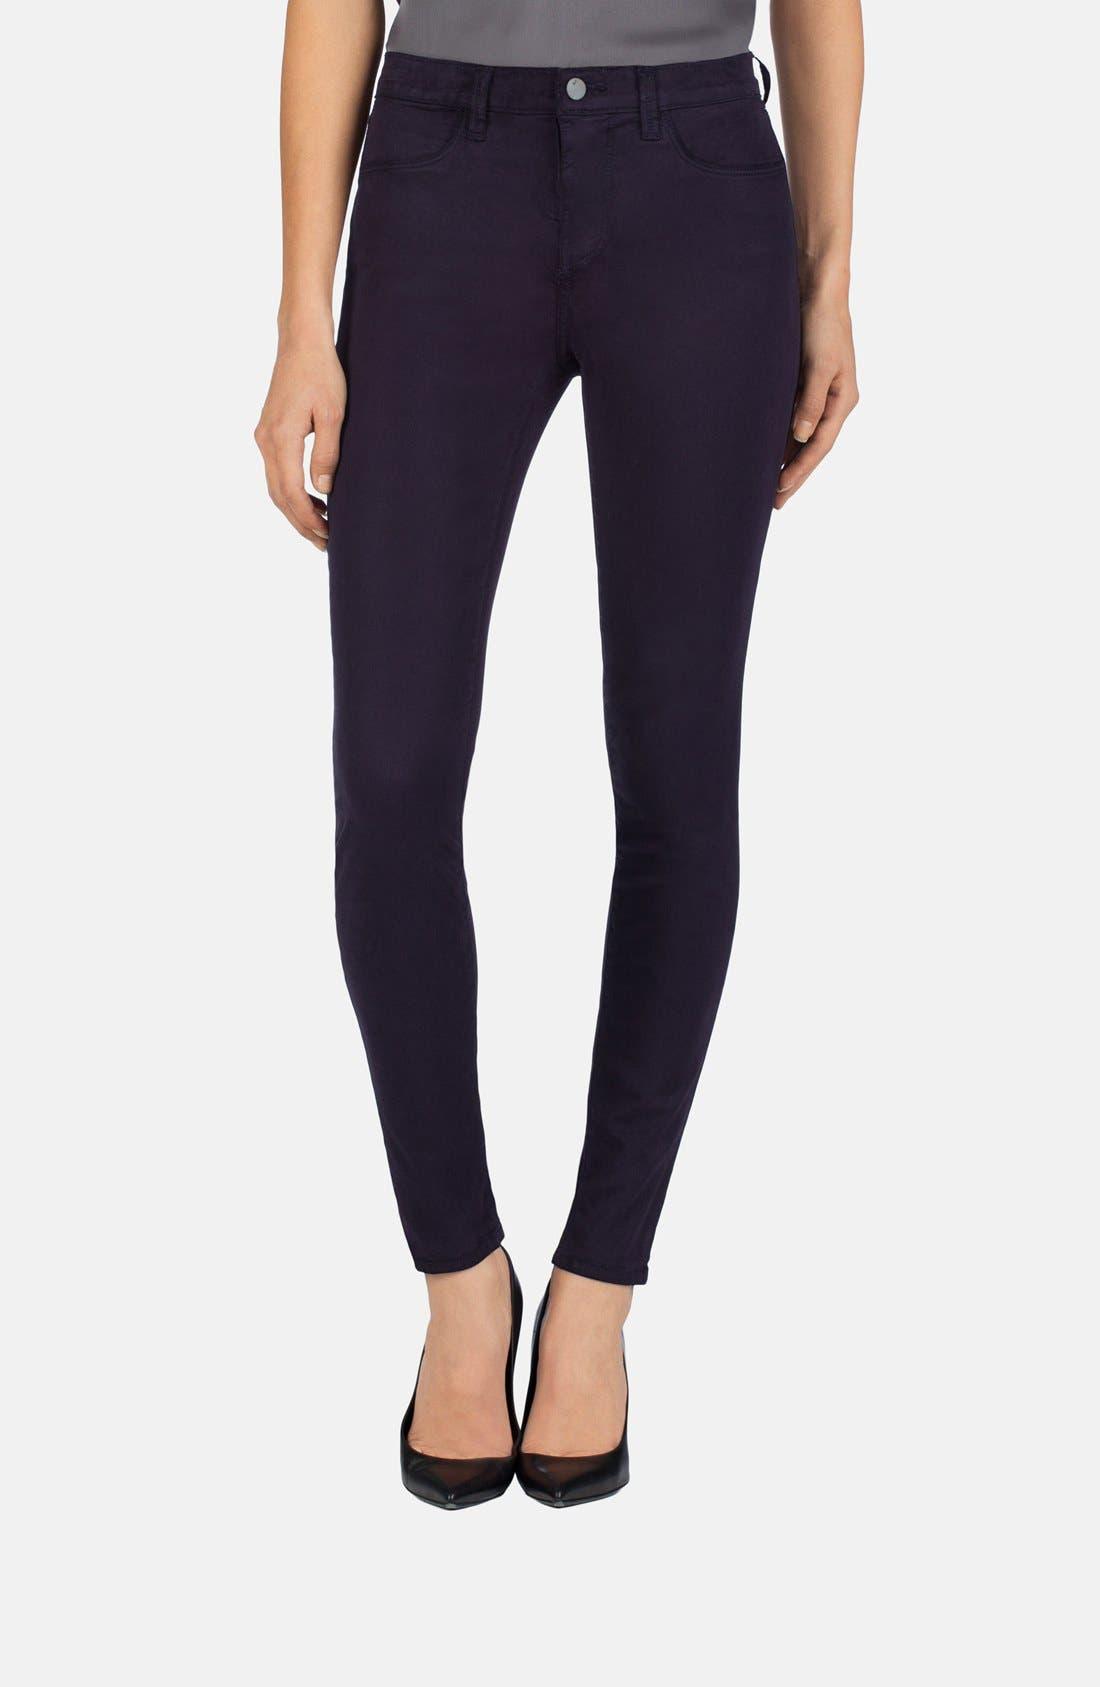 Alternate Image 1 Selected - J Brand '485' Mid Rise Super Skinny Jeans (Blackberry)